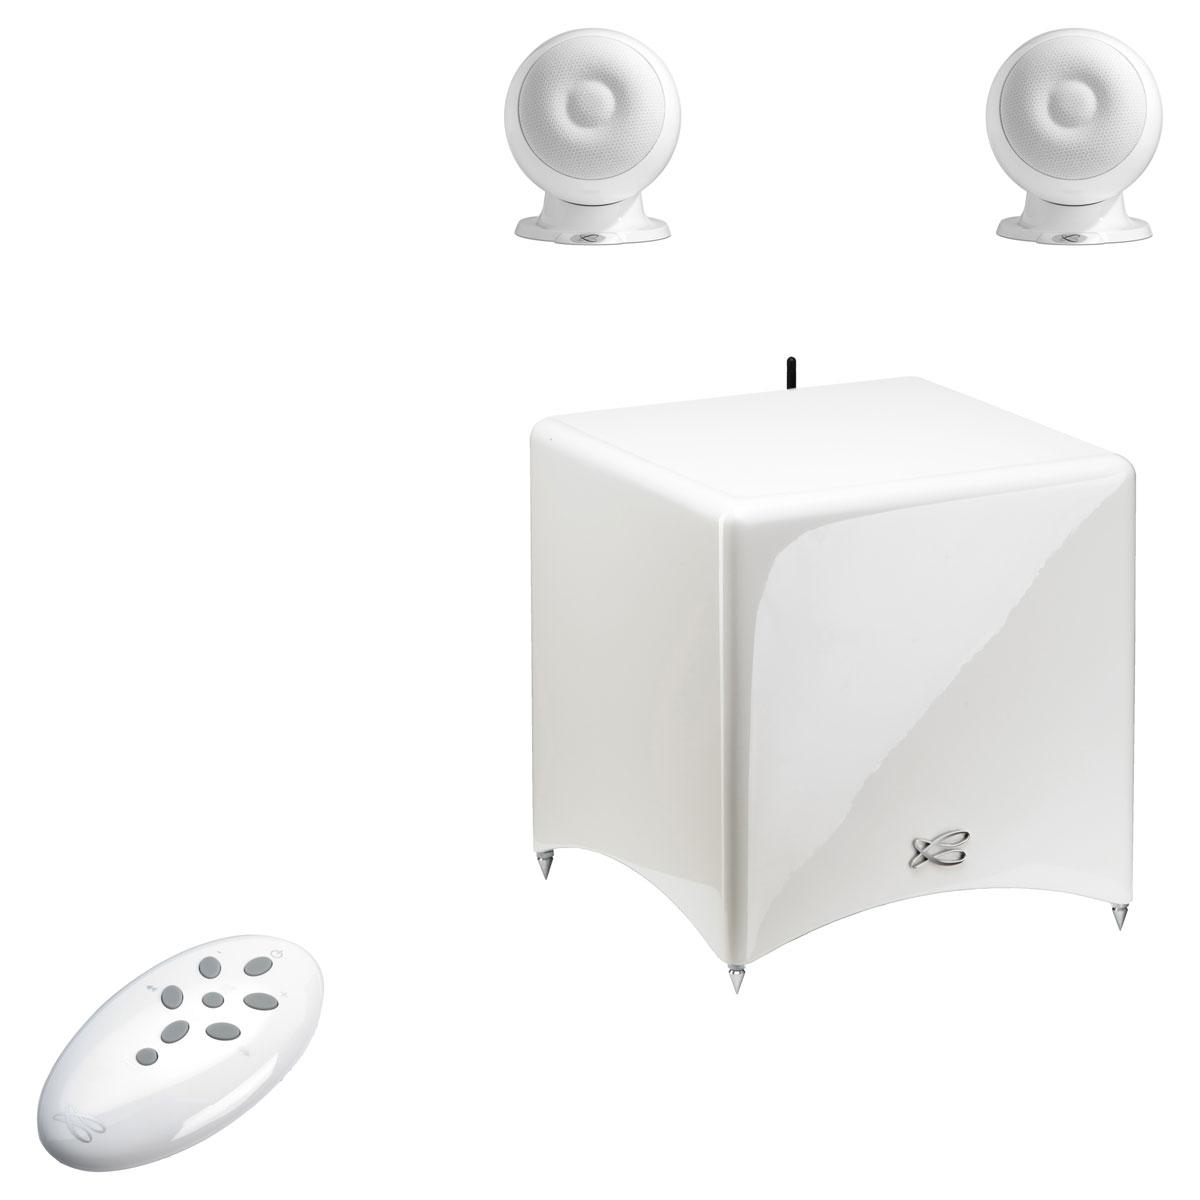 cabasse stream 3 blanc enceintes hifi cabasse sur. Black Bedroom Furniture Sets. Home Design Ideas